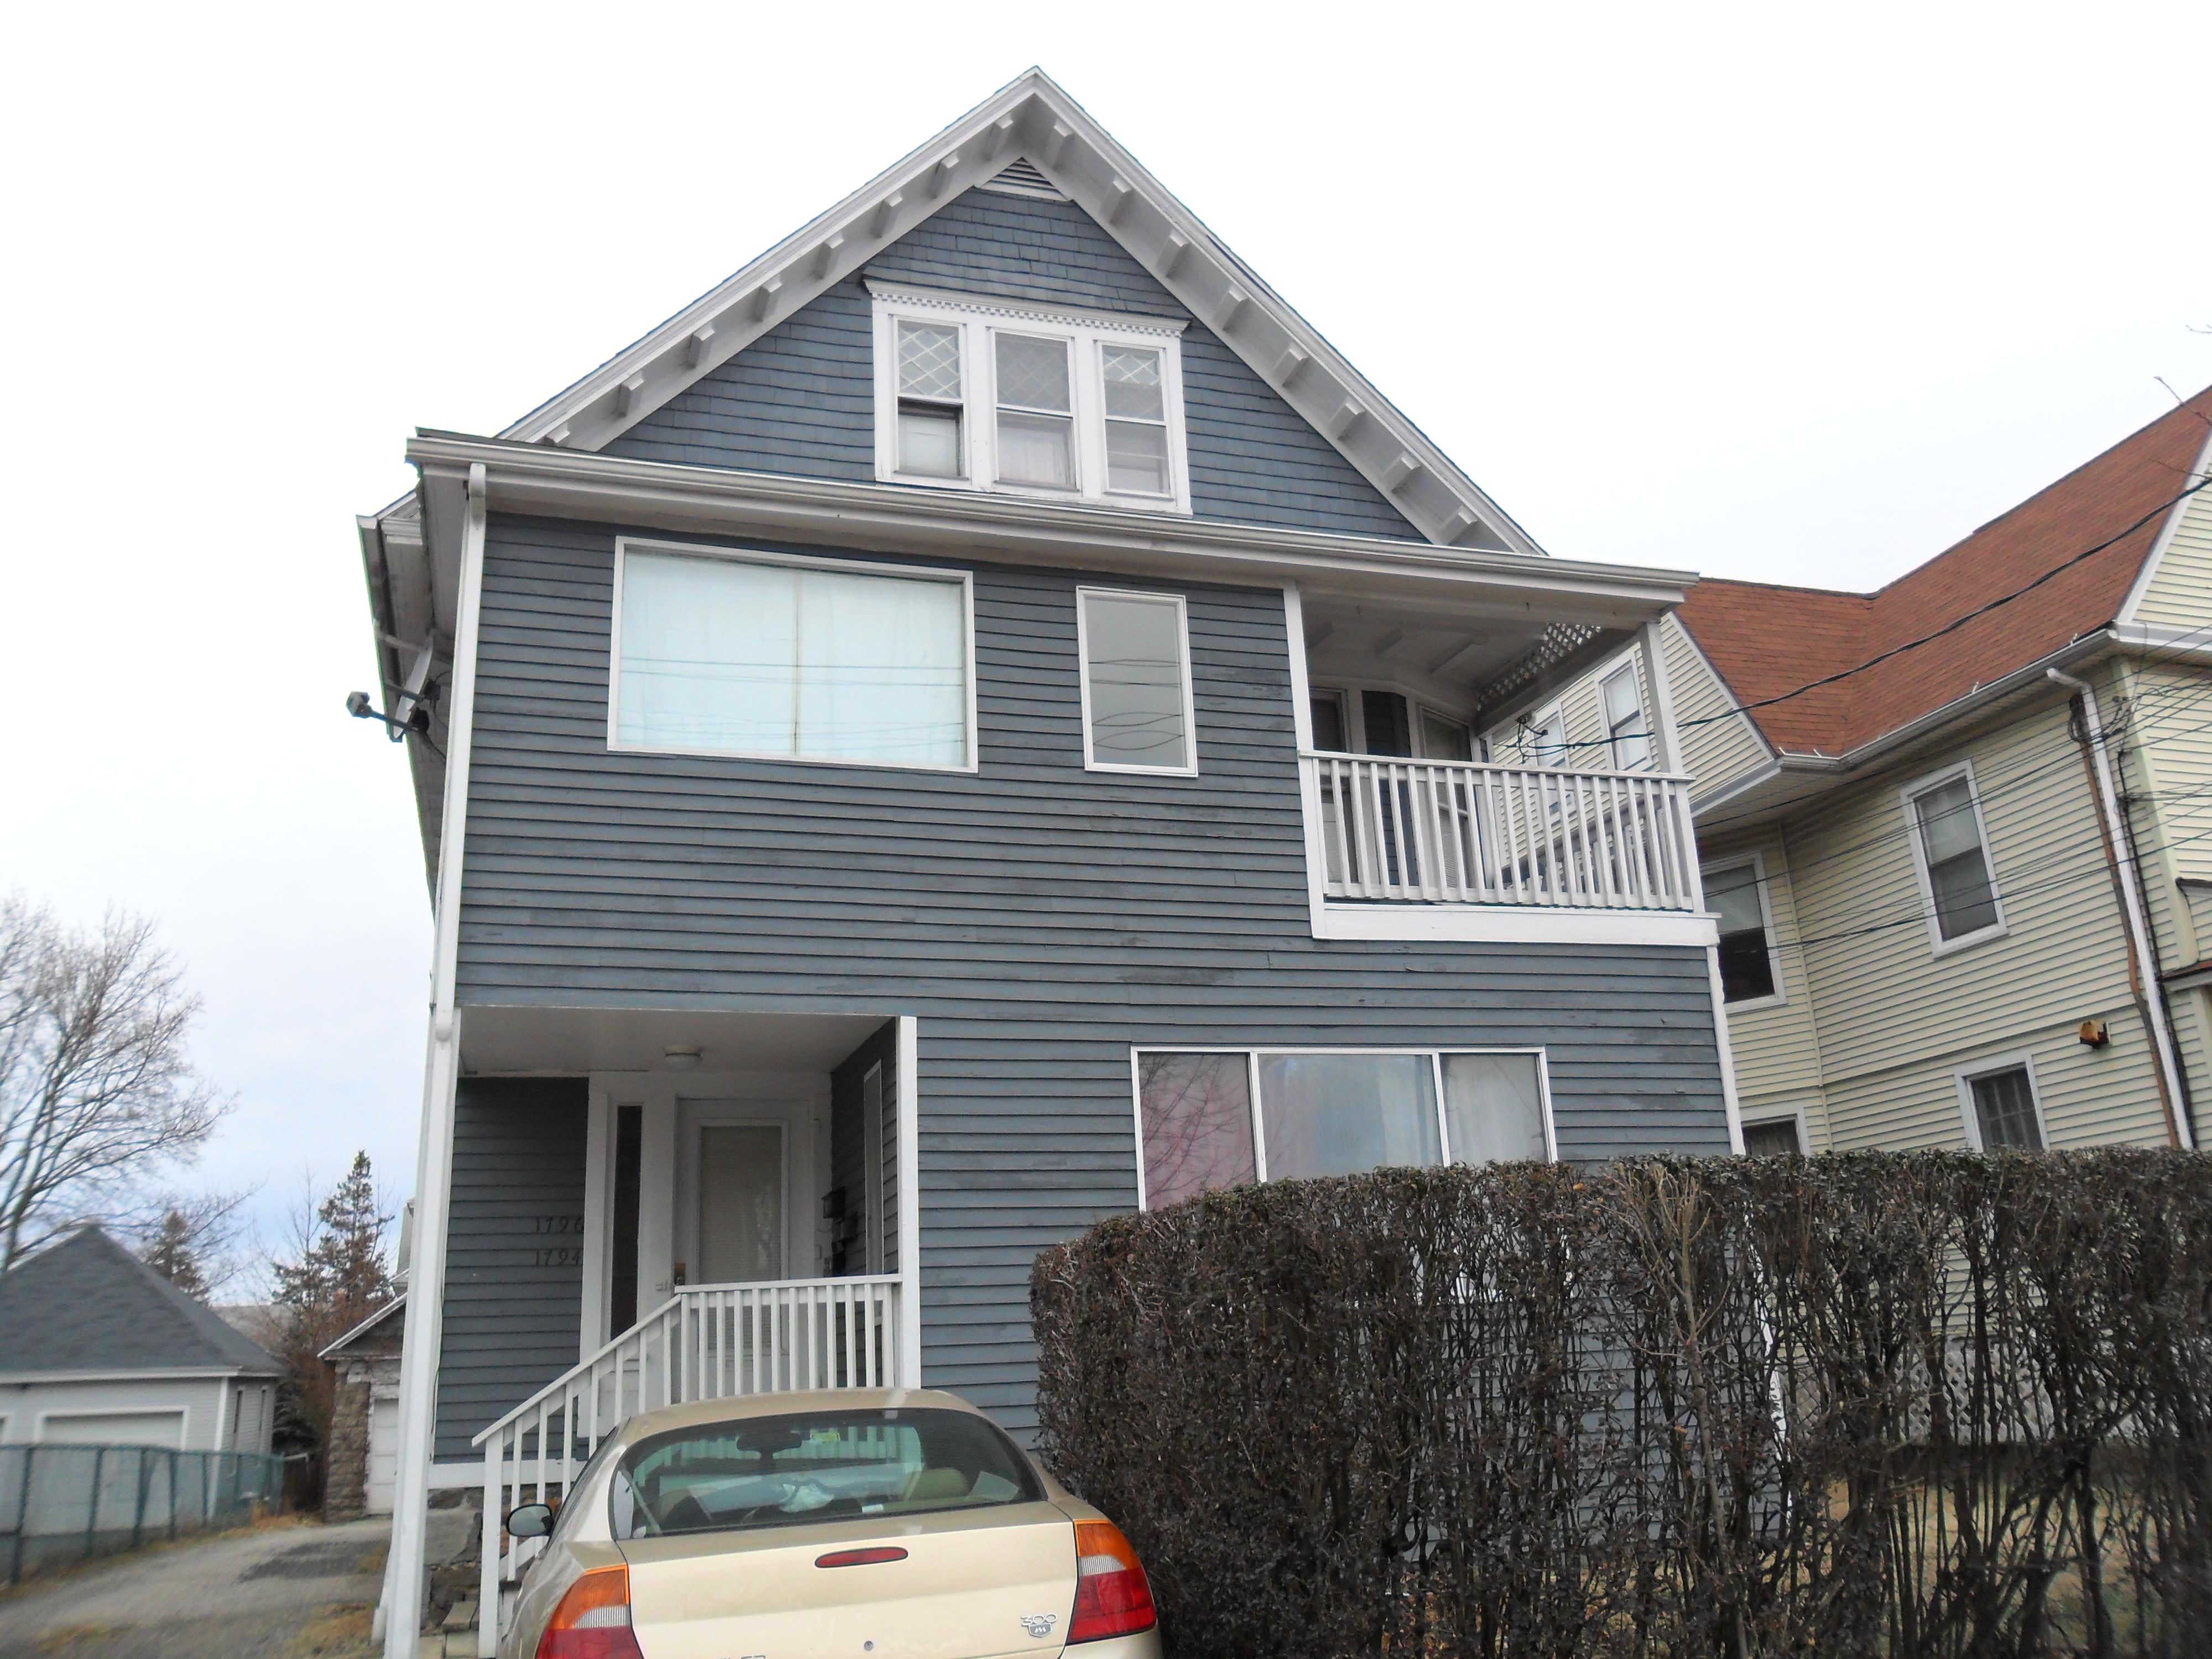 Top 20 Apartments for Rent with Balconies for Rent in Bridgeport, CT